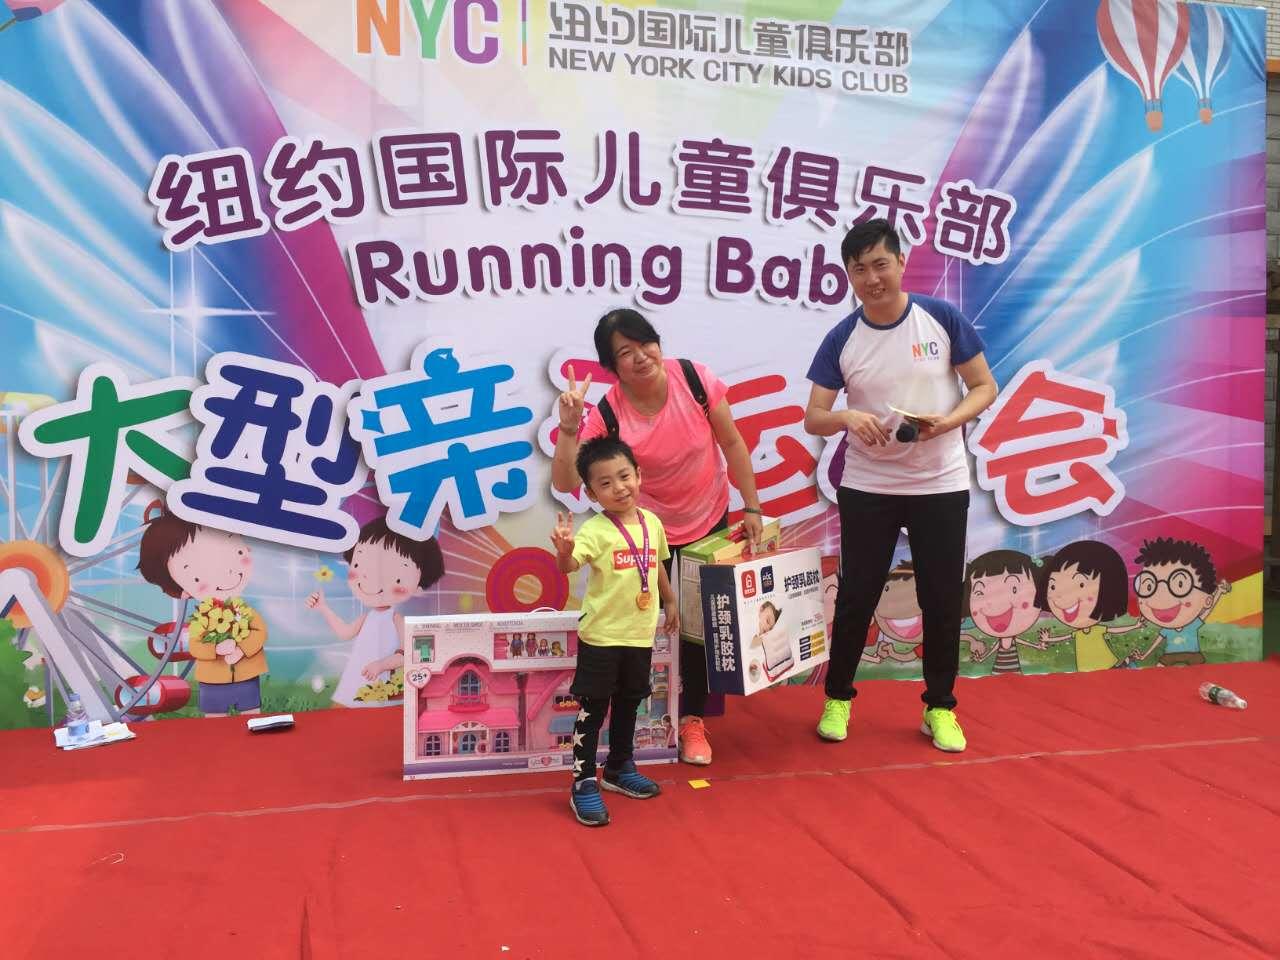 NYC纽约国际唐山福地早教中心:NYC第一届大型亲子运动会《Running baby》回顾